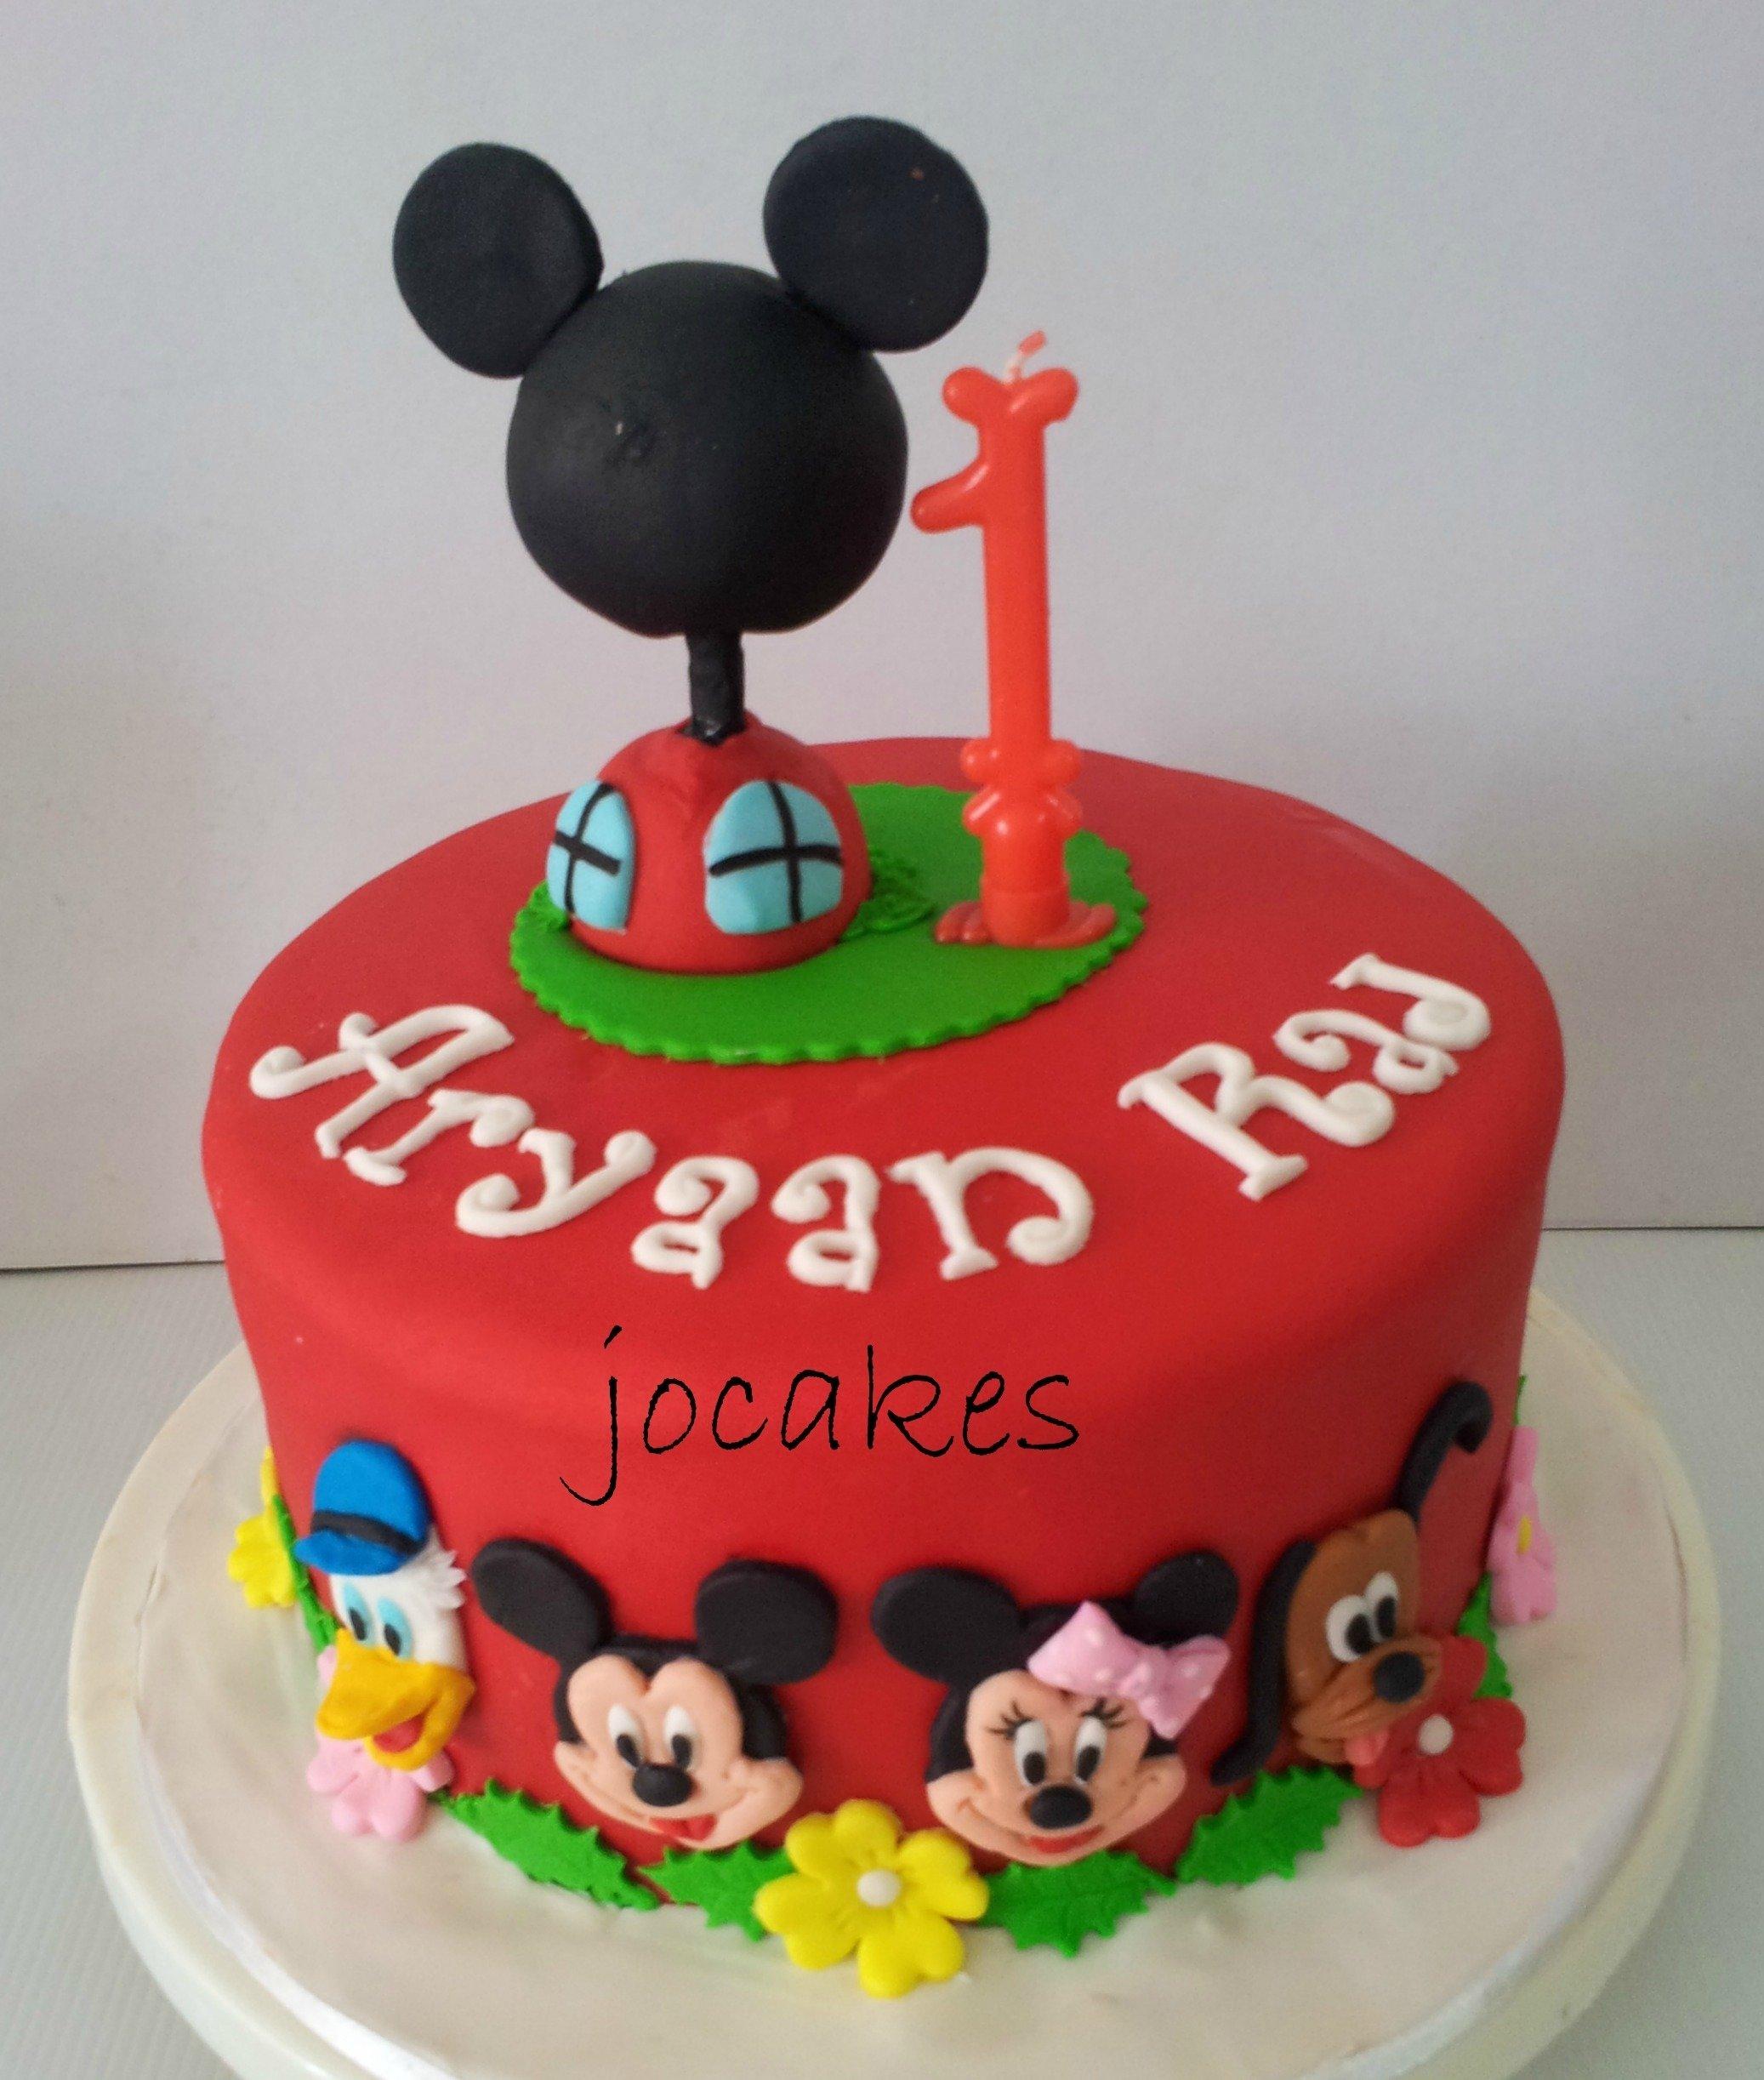 10 Amazing 2 Year Old Birthday Cake Ideas birthday cakes images 1 year old birthday cake for your baby food